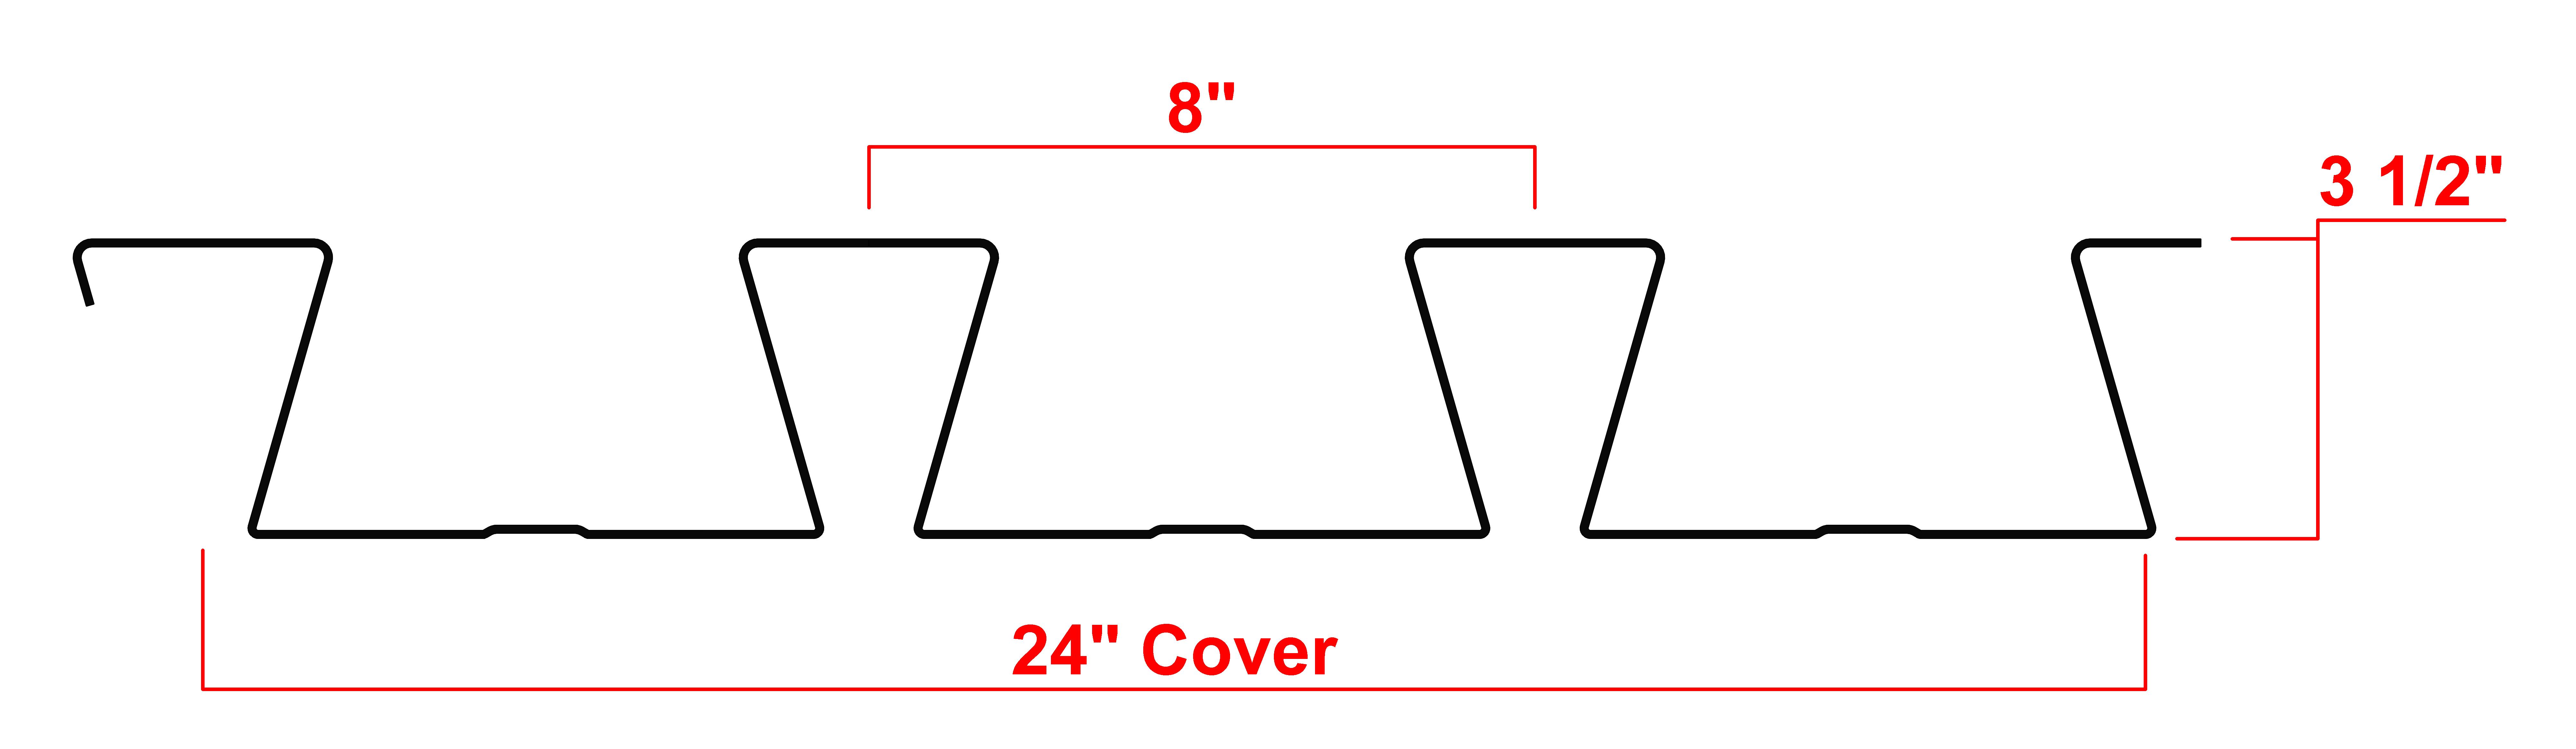 3.5 Dovetail Deck Profile